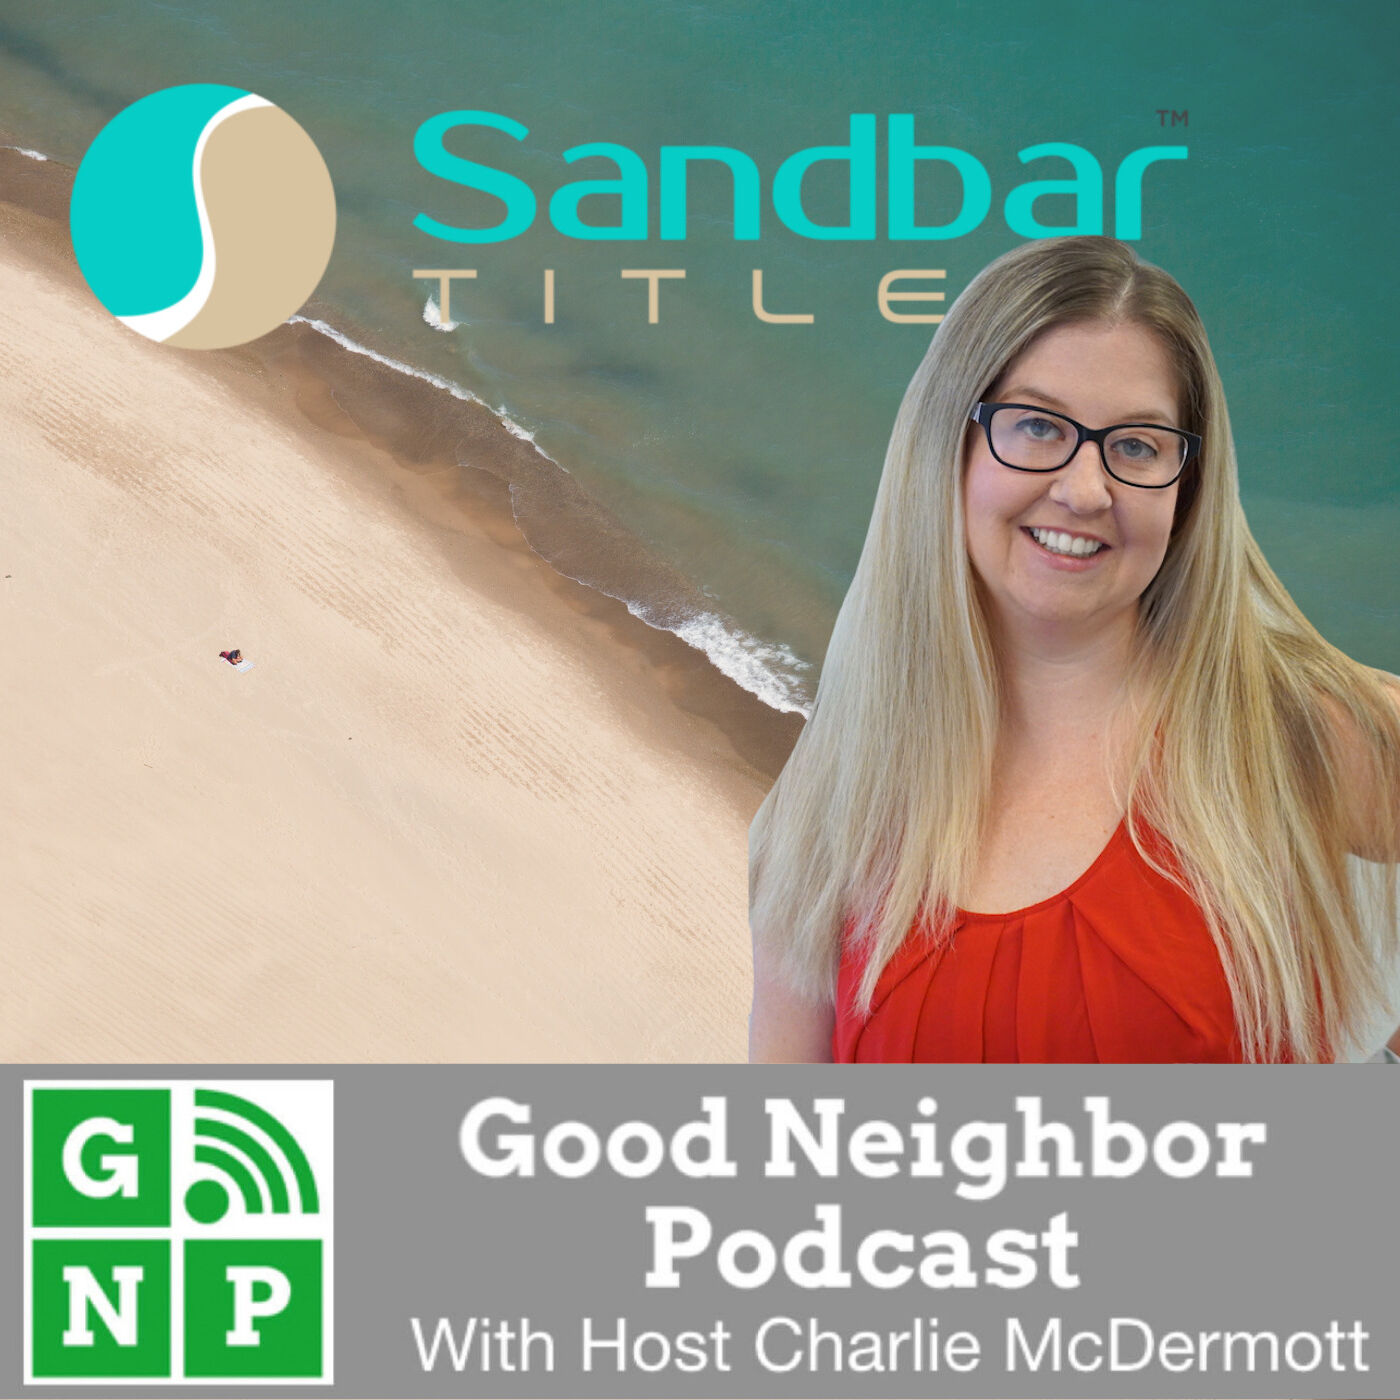 EP #518: Sandbar Title with Vanessa Rogers